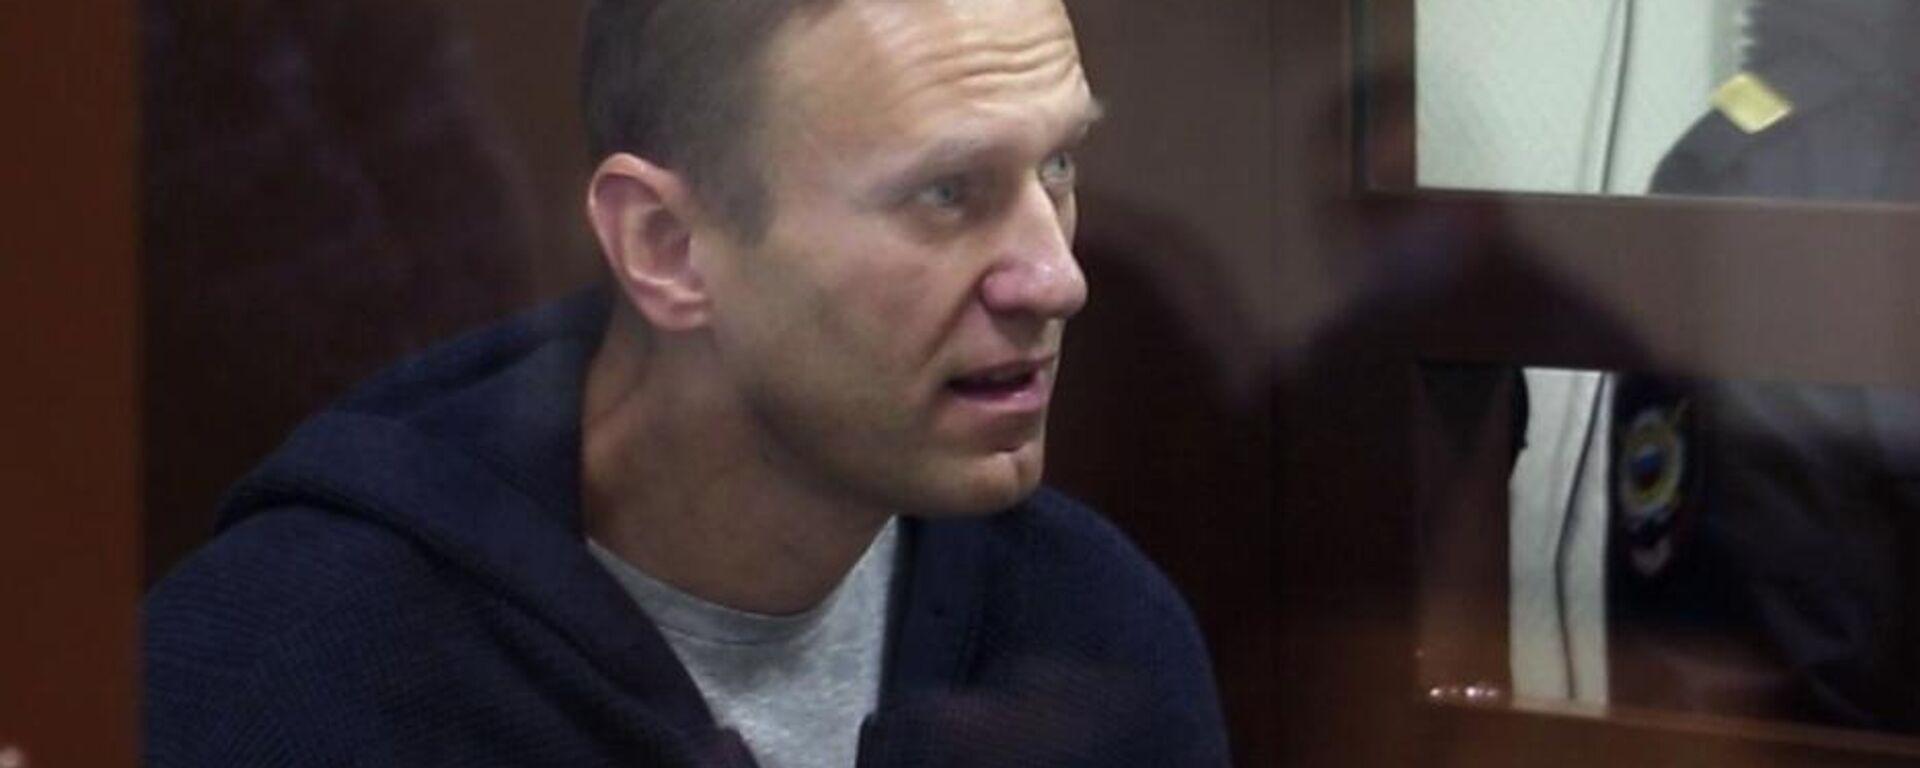 Alexéi Navalni, bloguero opositor ruso - Sputnik Mundo, 1920, 08.10.2021